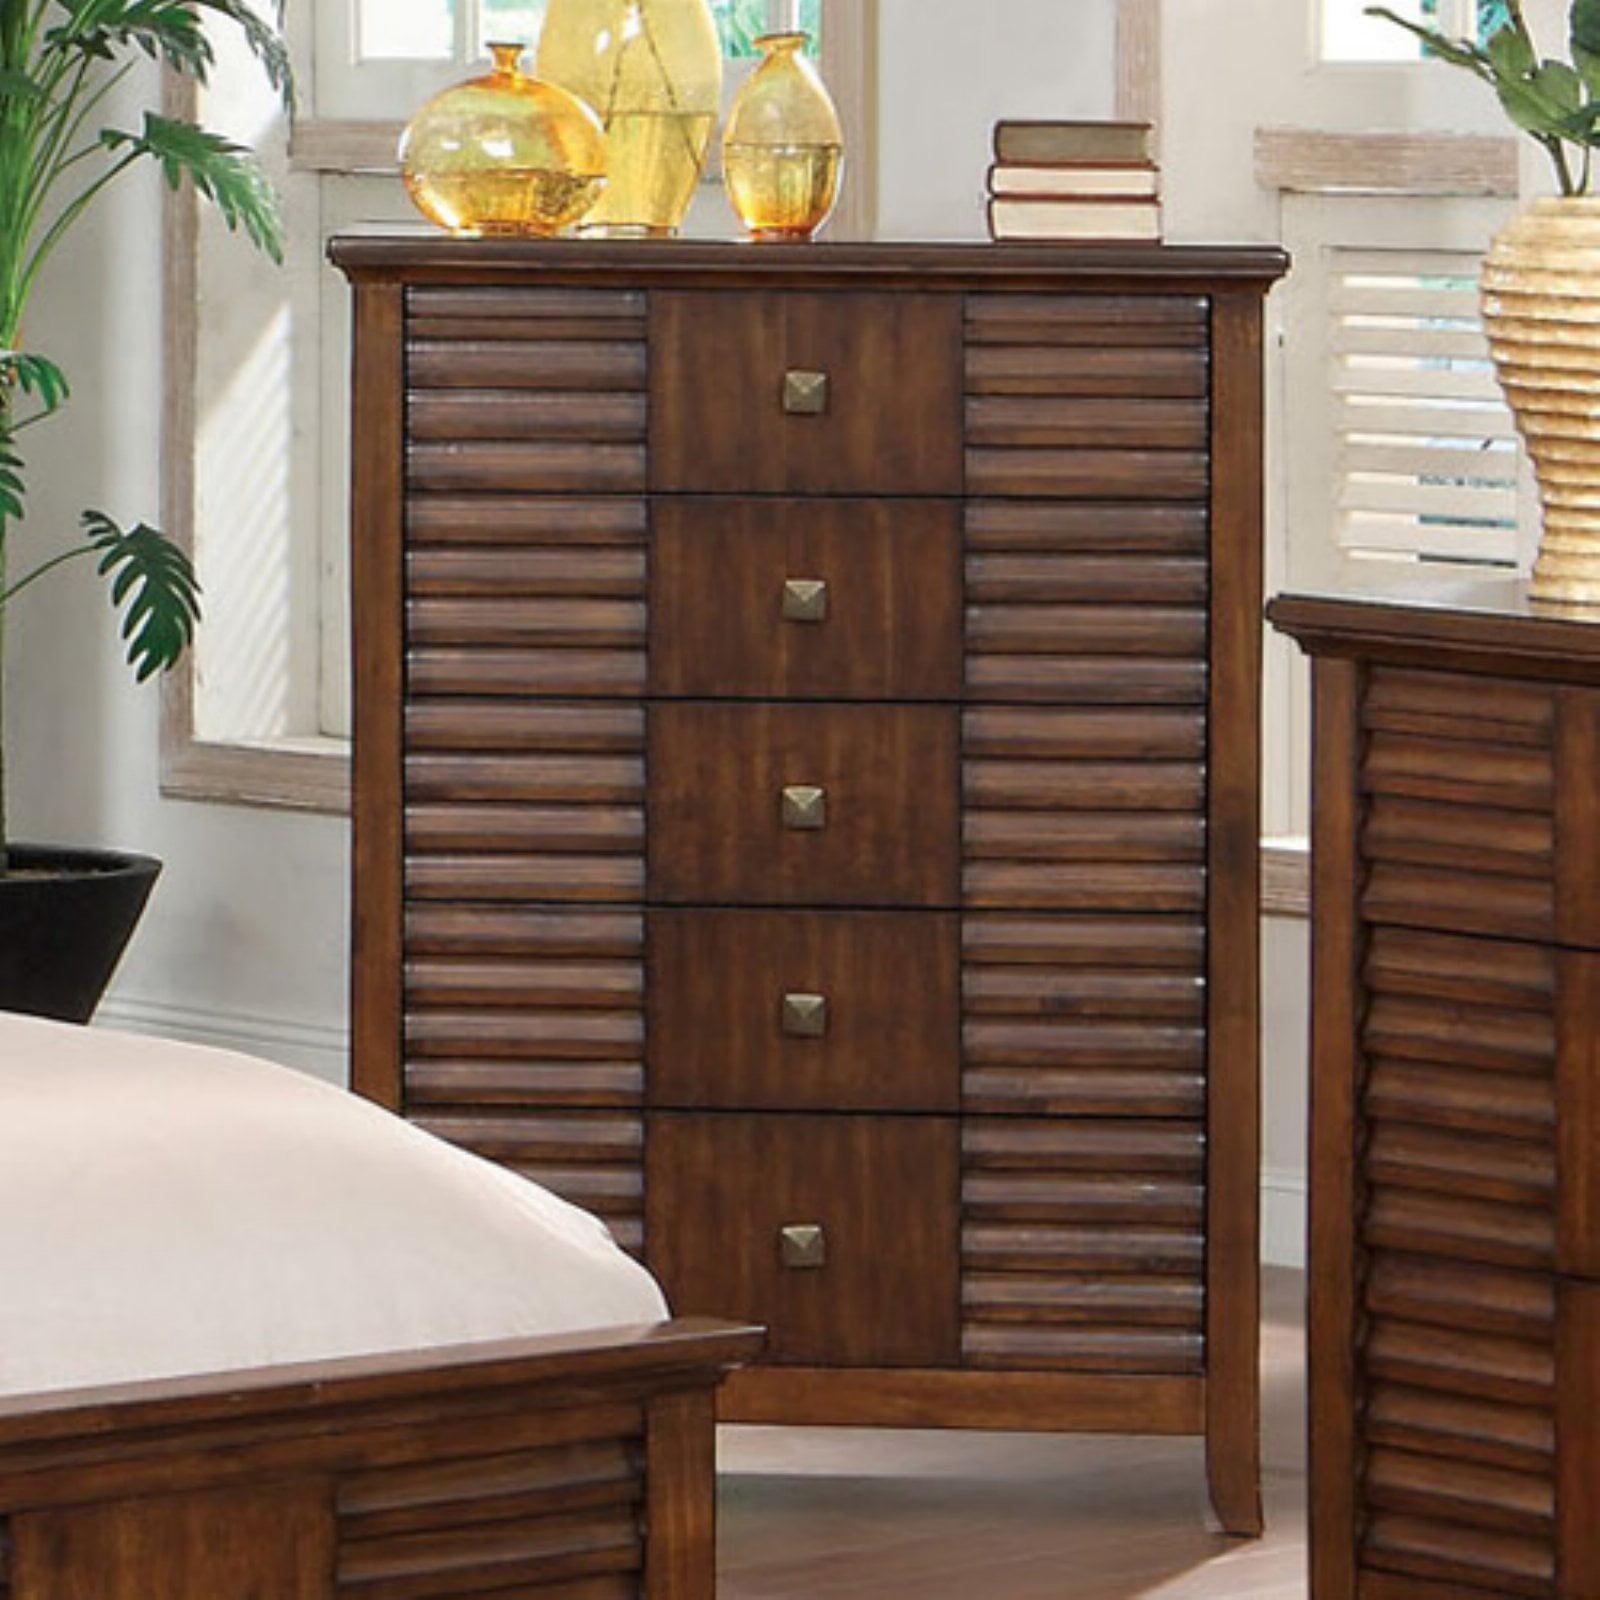 Furniture of America Stenner Slats 5 Drawer Chest - Walnut